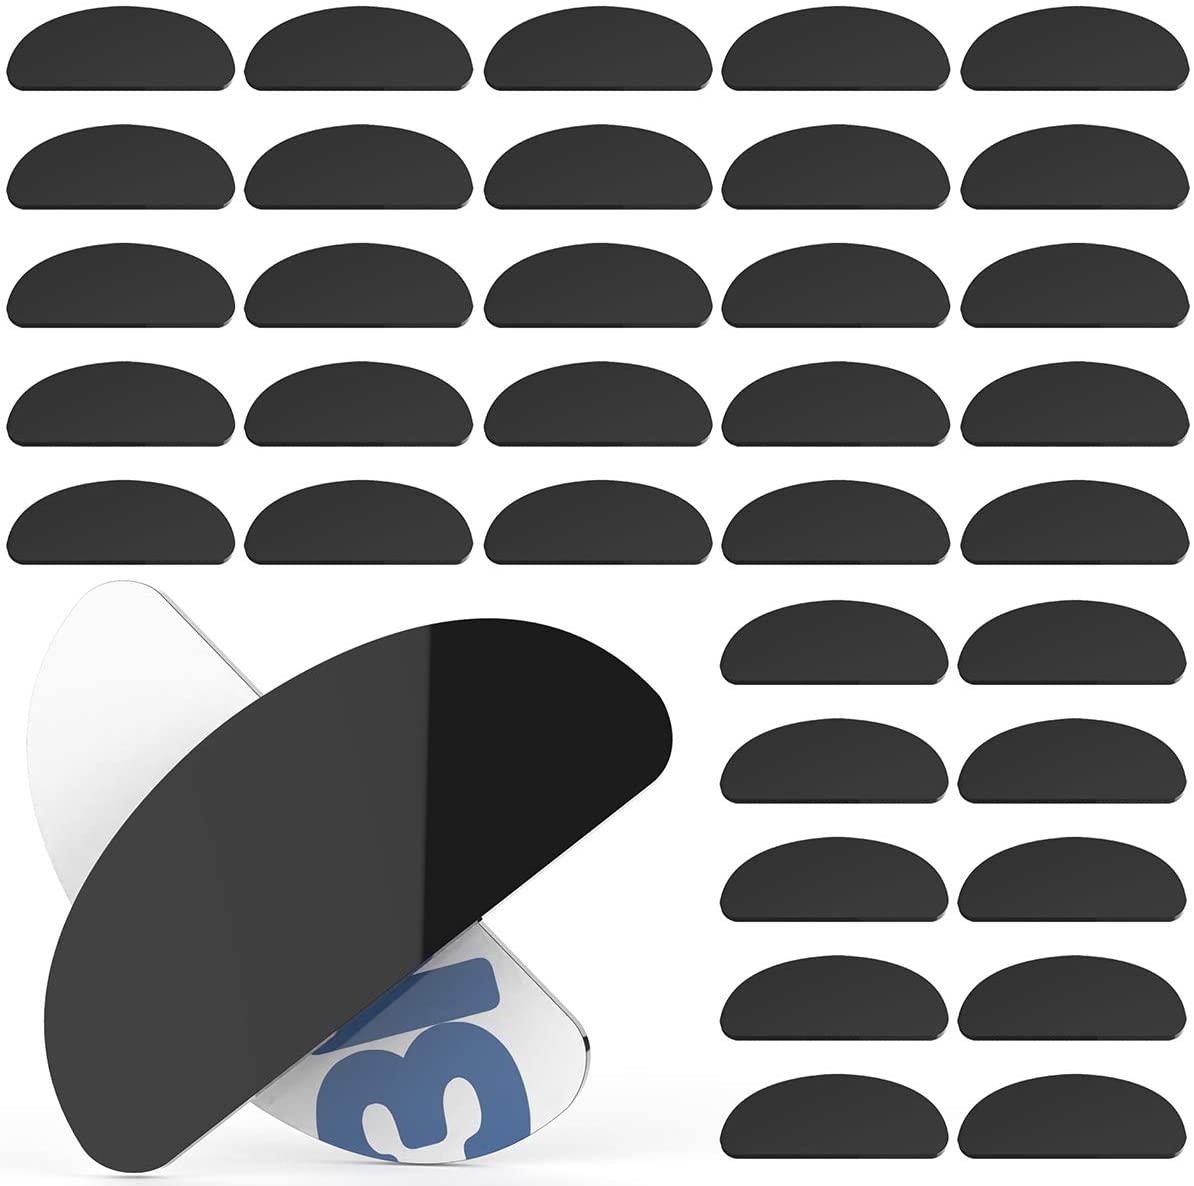 20 Pairs Nose Pads for Eyeglasses Silicone Adhesive Anti-Slip Eyeglass Nose Pads Sunglasses (Black)